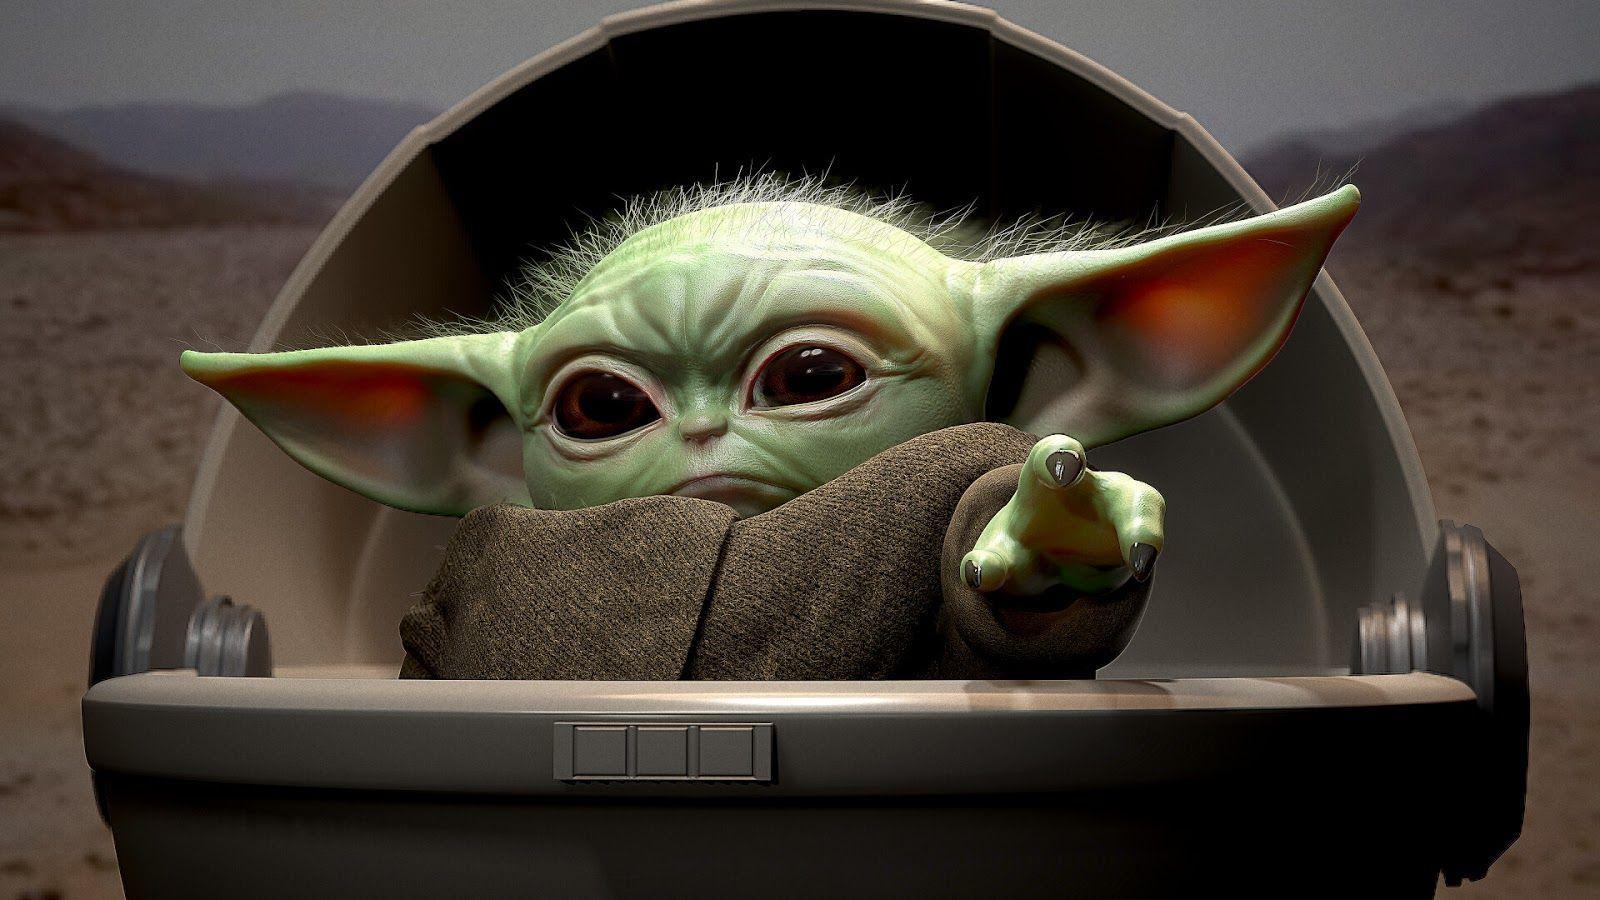 Baby Yoda Desktop Wallpapers Top Free Baby Yoda Desktop Backgrounds Wallpaperaccess